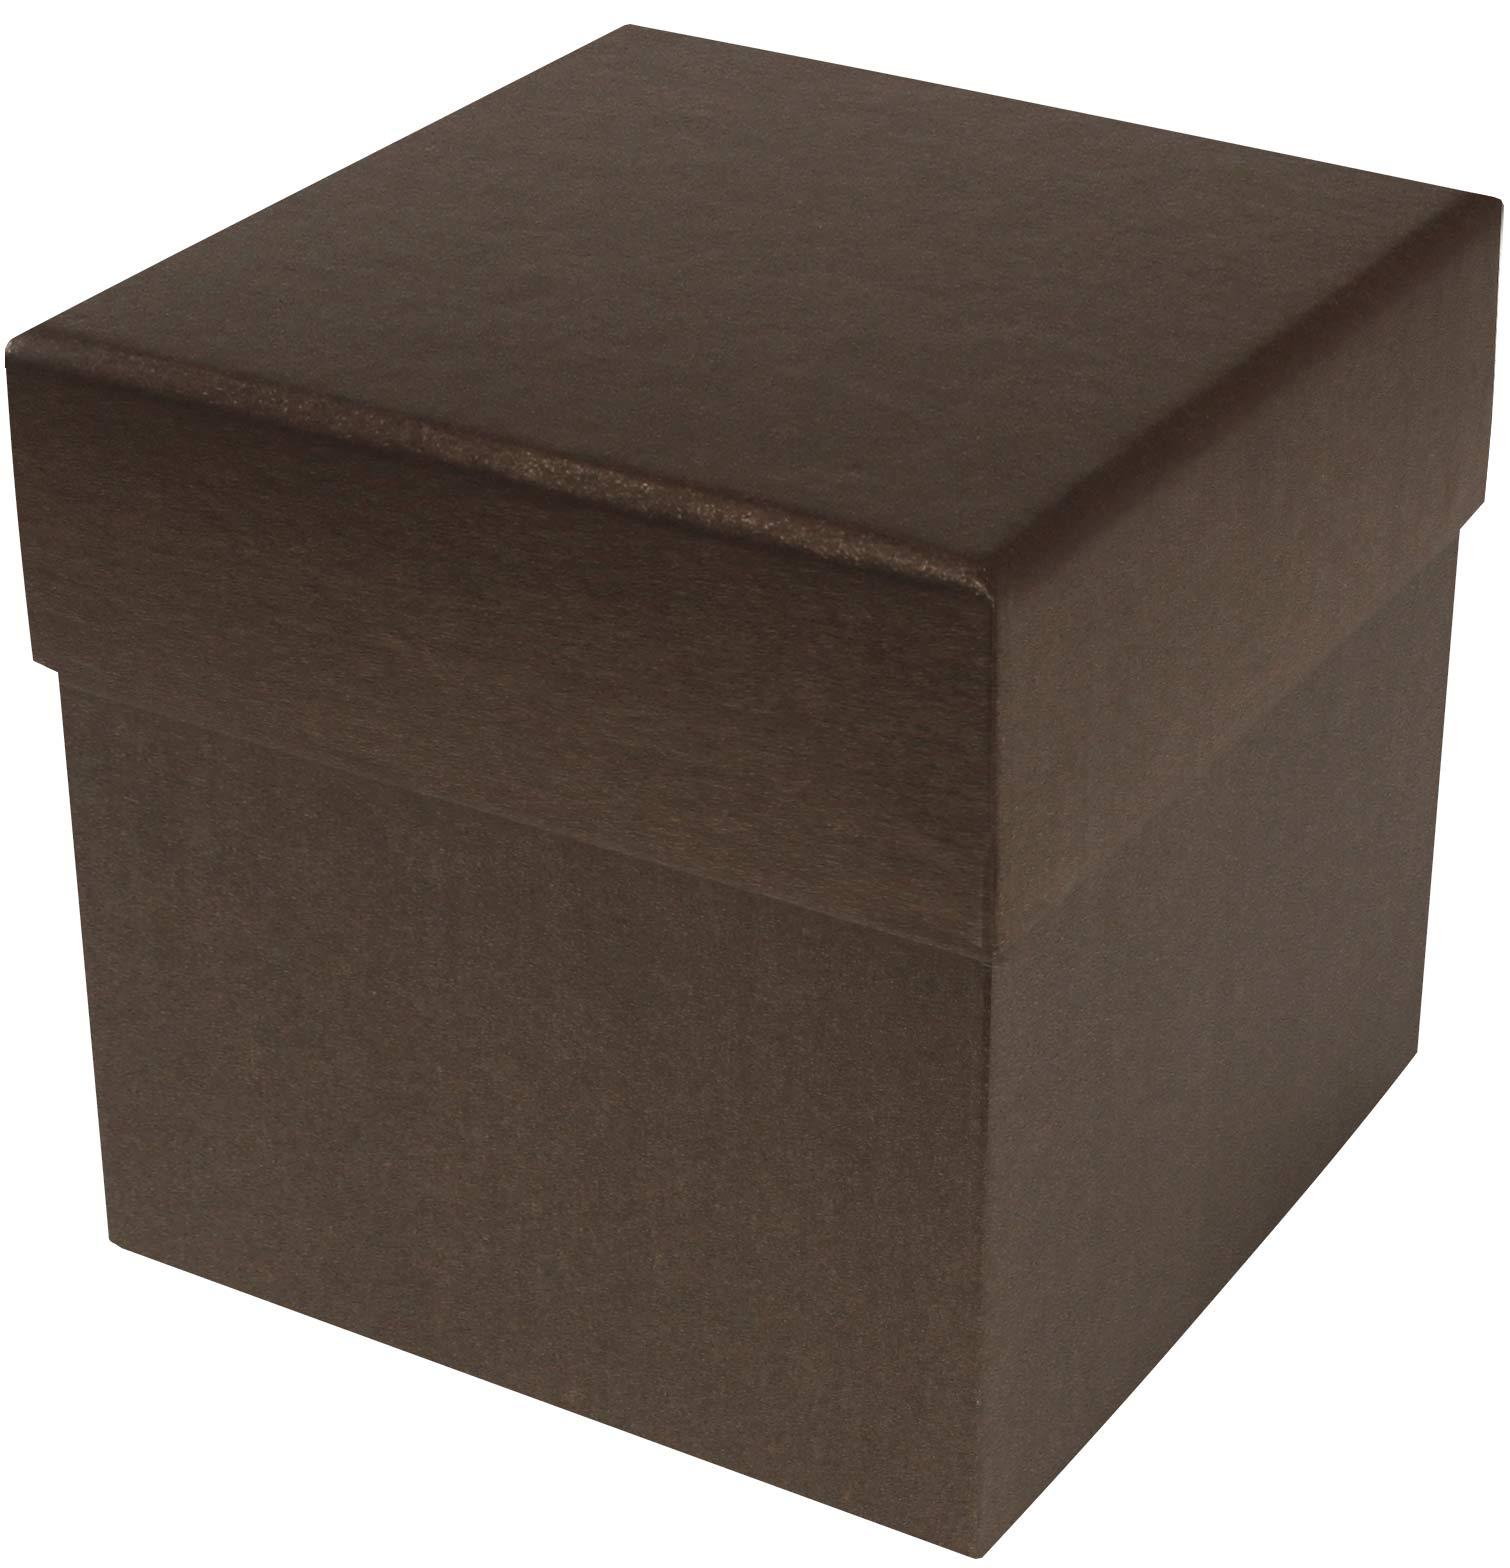 Rigid Set Up Box Cube 4 Tier Deco Bronze Qty Case 12